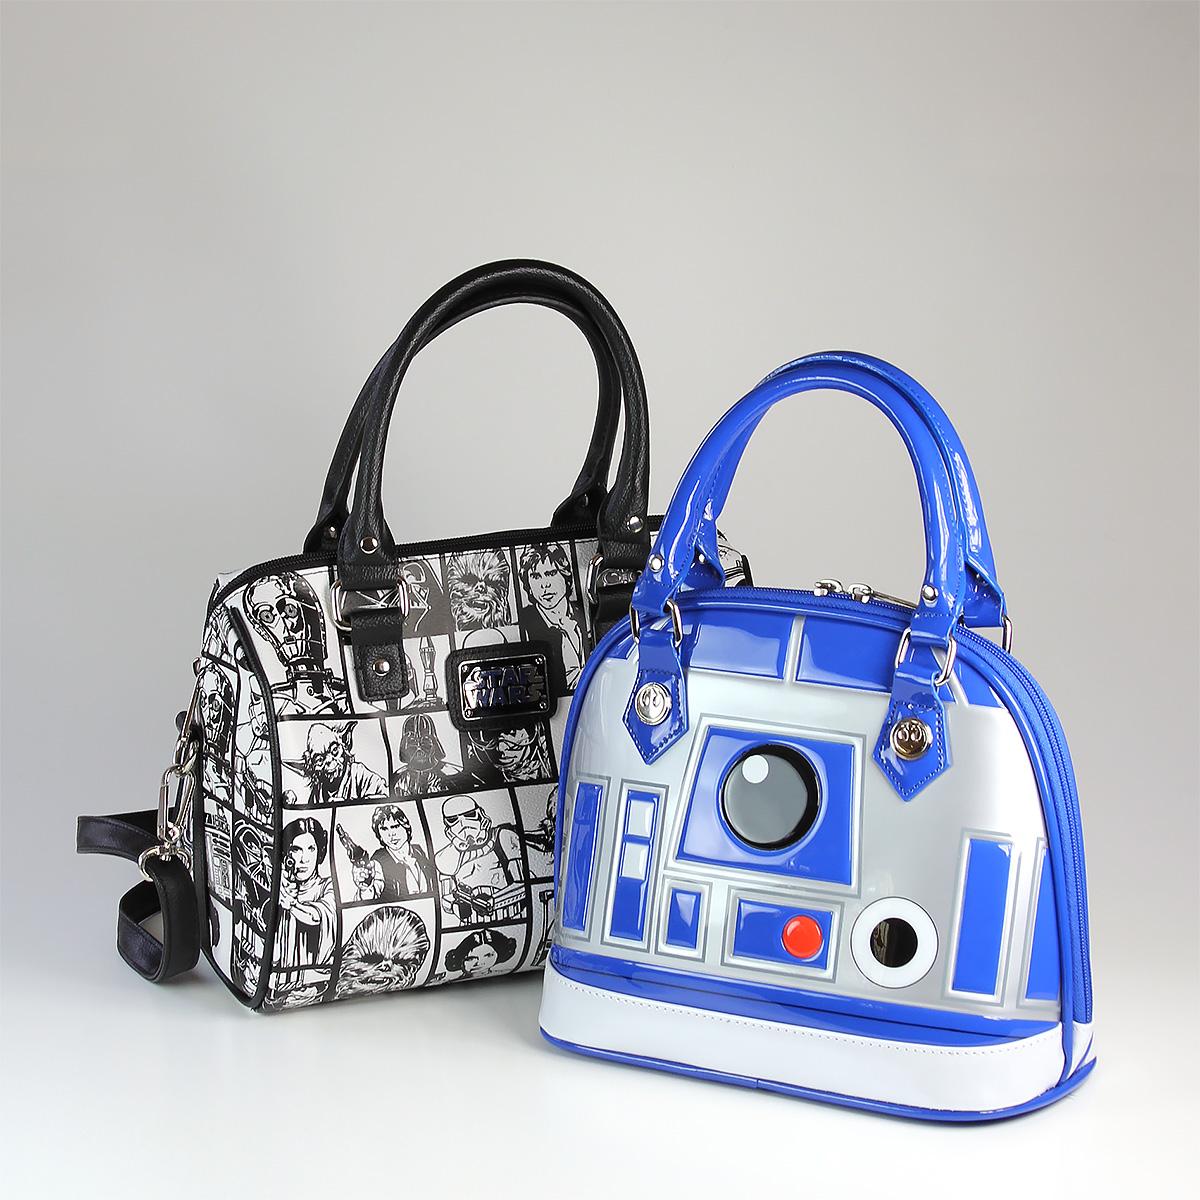 Loungefly - R2-D2 and comic print handbags